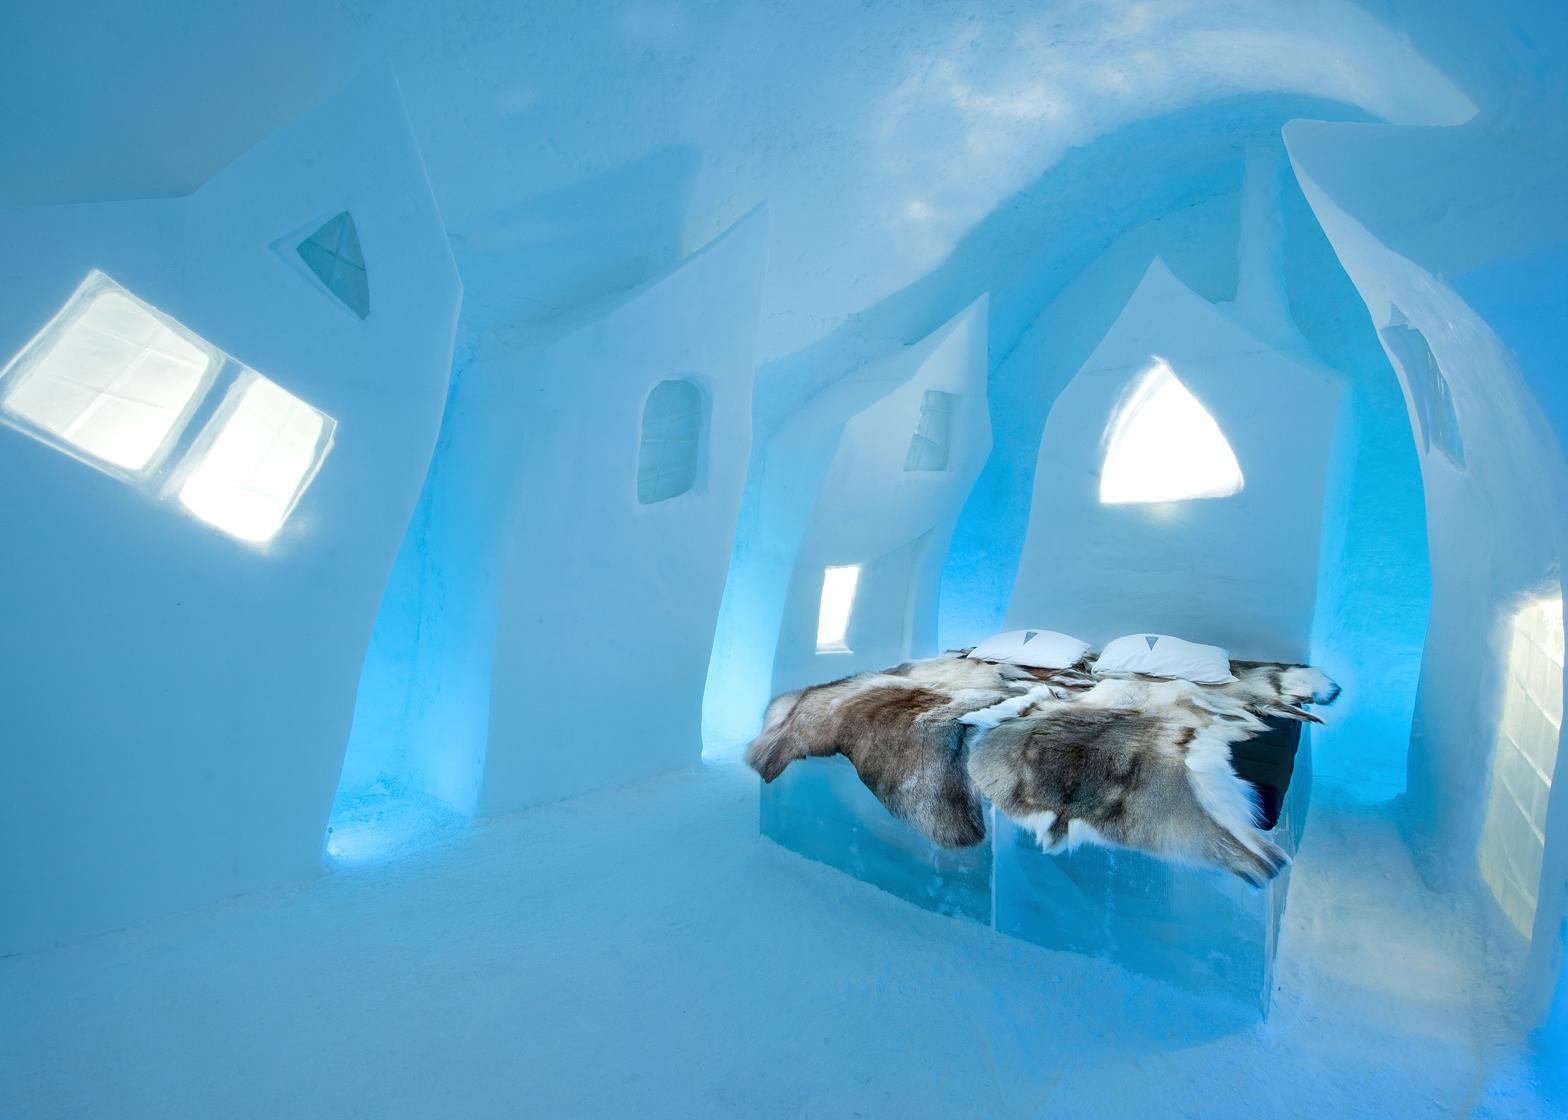 architecture-ice-hotel-design-studia-interiors-osnovadesign-osnova-poltava-07